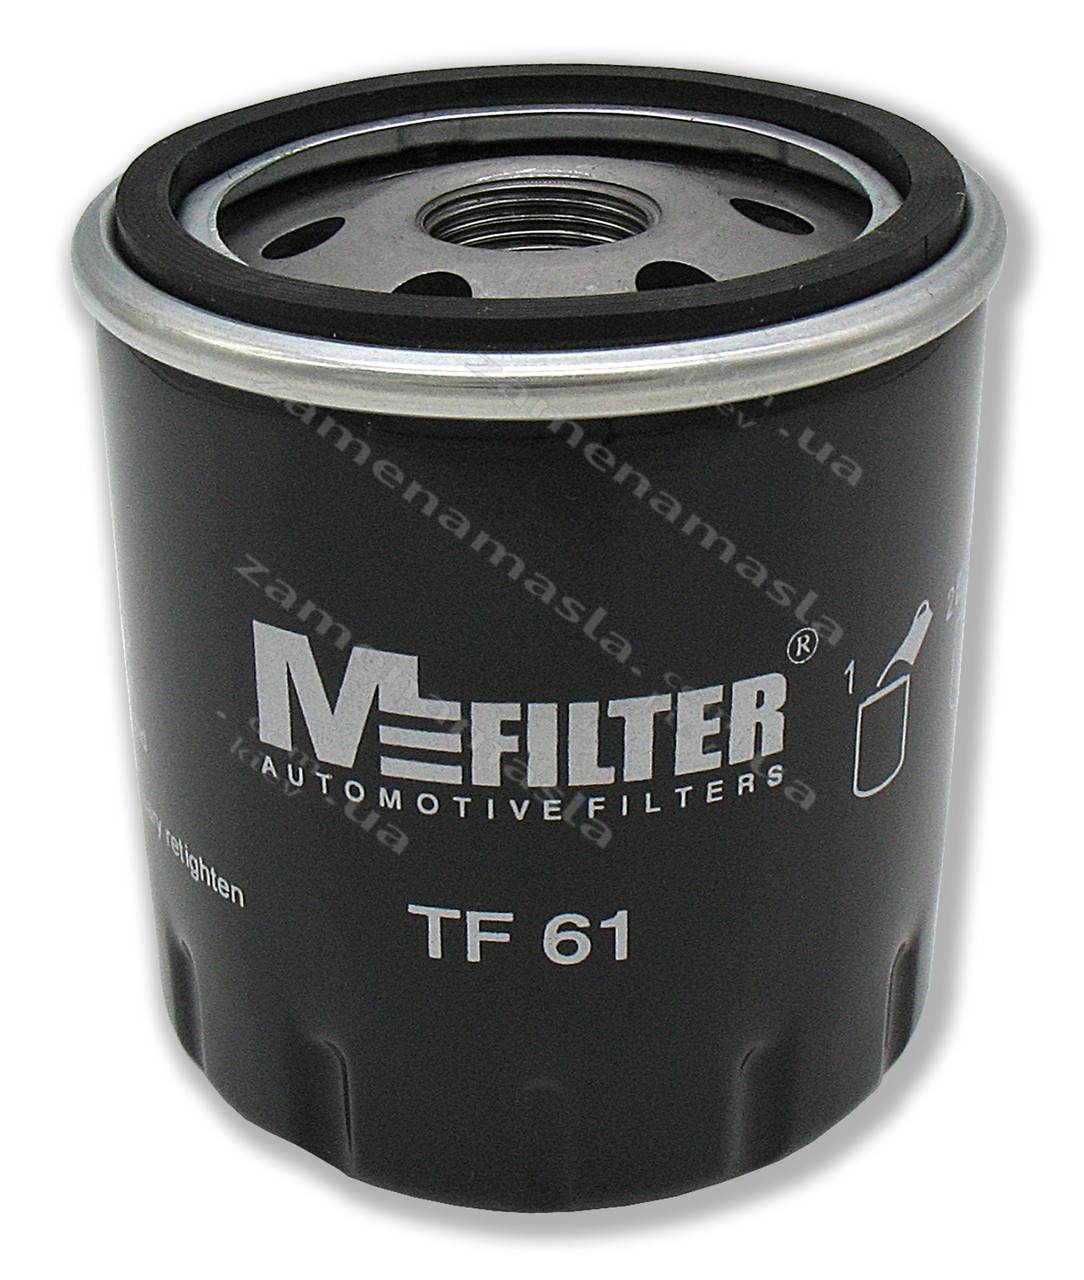 Mfilter TF61 аналог SM-113 на Citroën, Peugeot, Renault